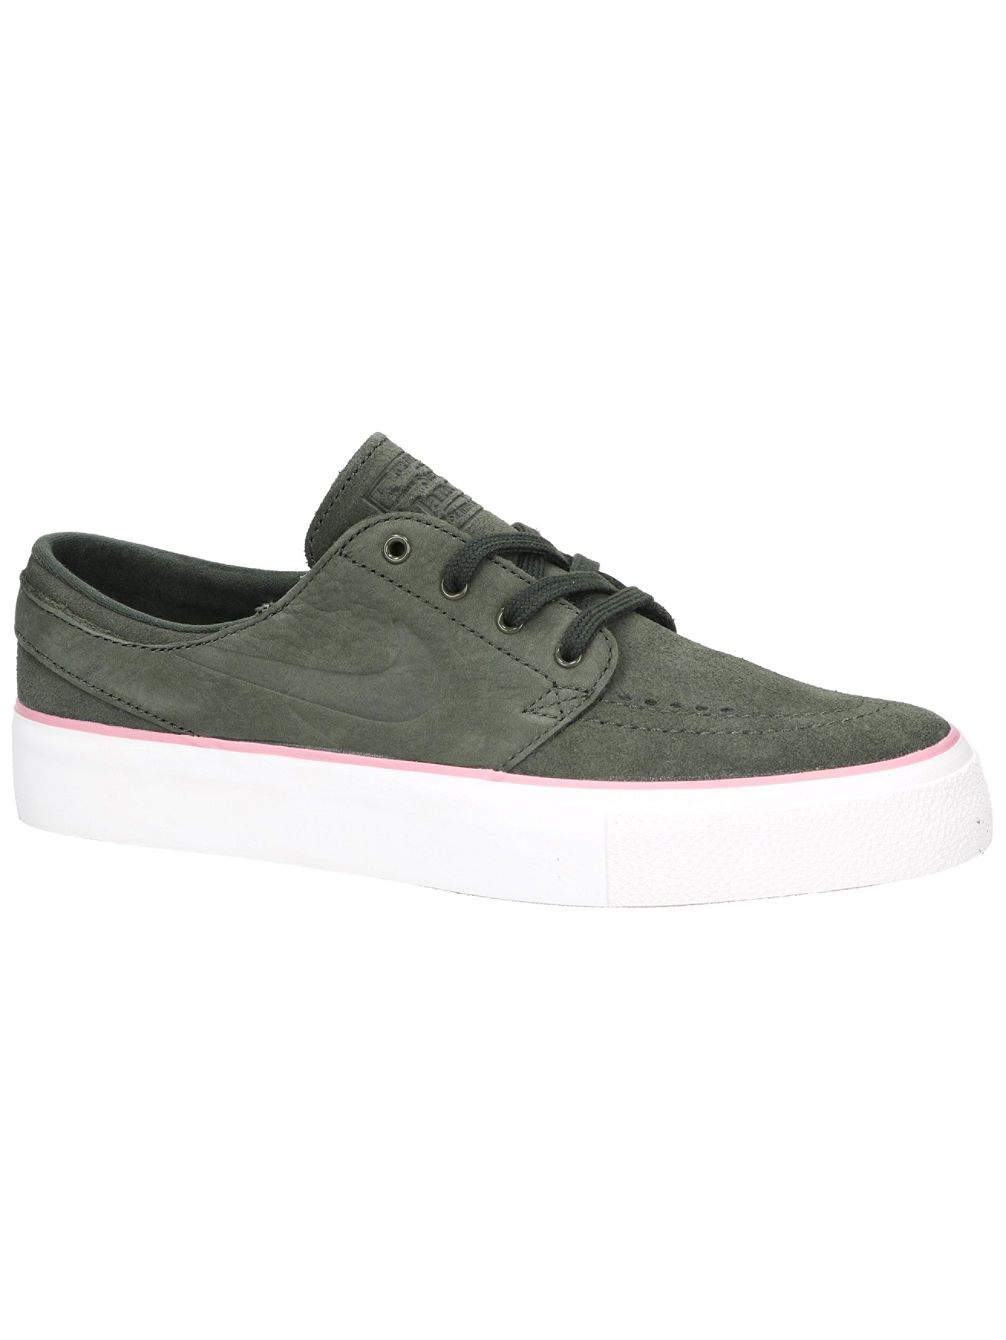 Buy Nike SB Zoom Stefan Janoski HT Skate Shoes Boys online at blue ... 4c5a5ff60b98